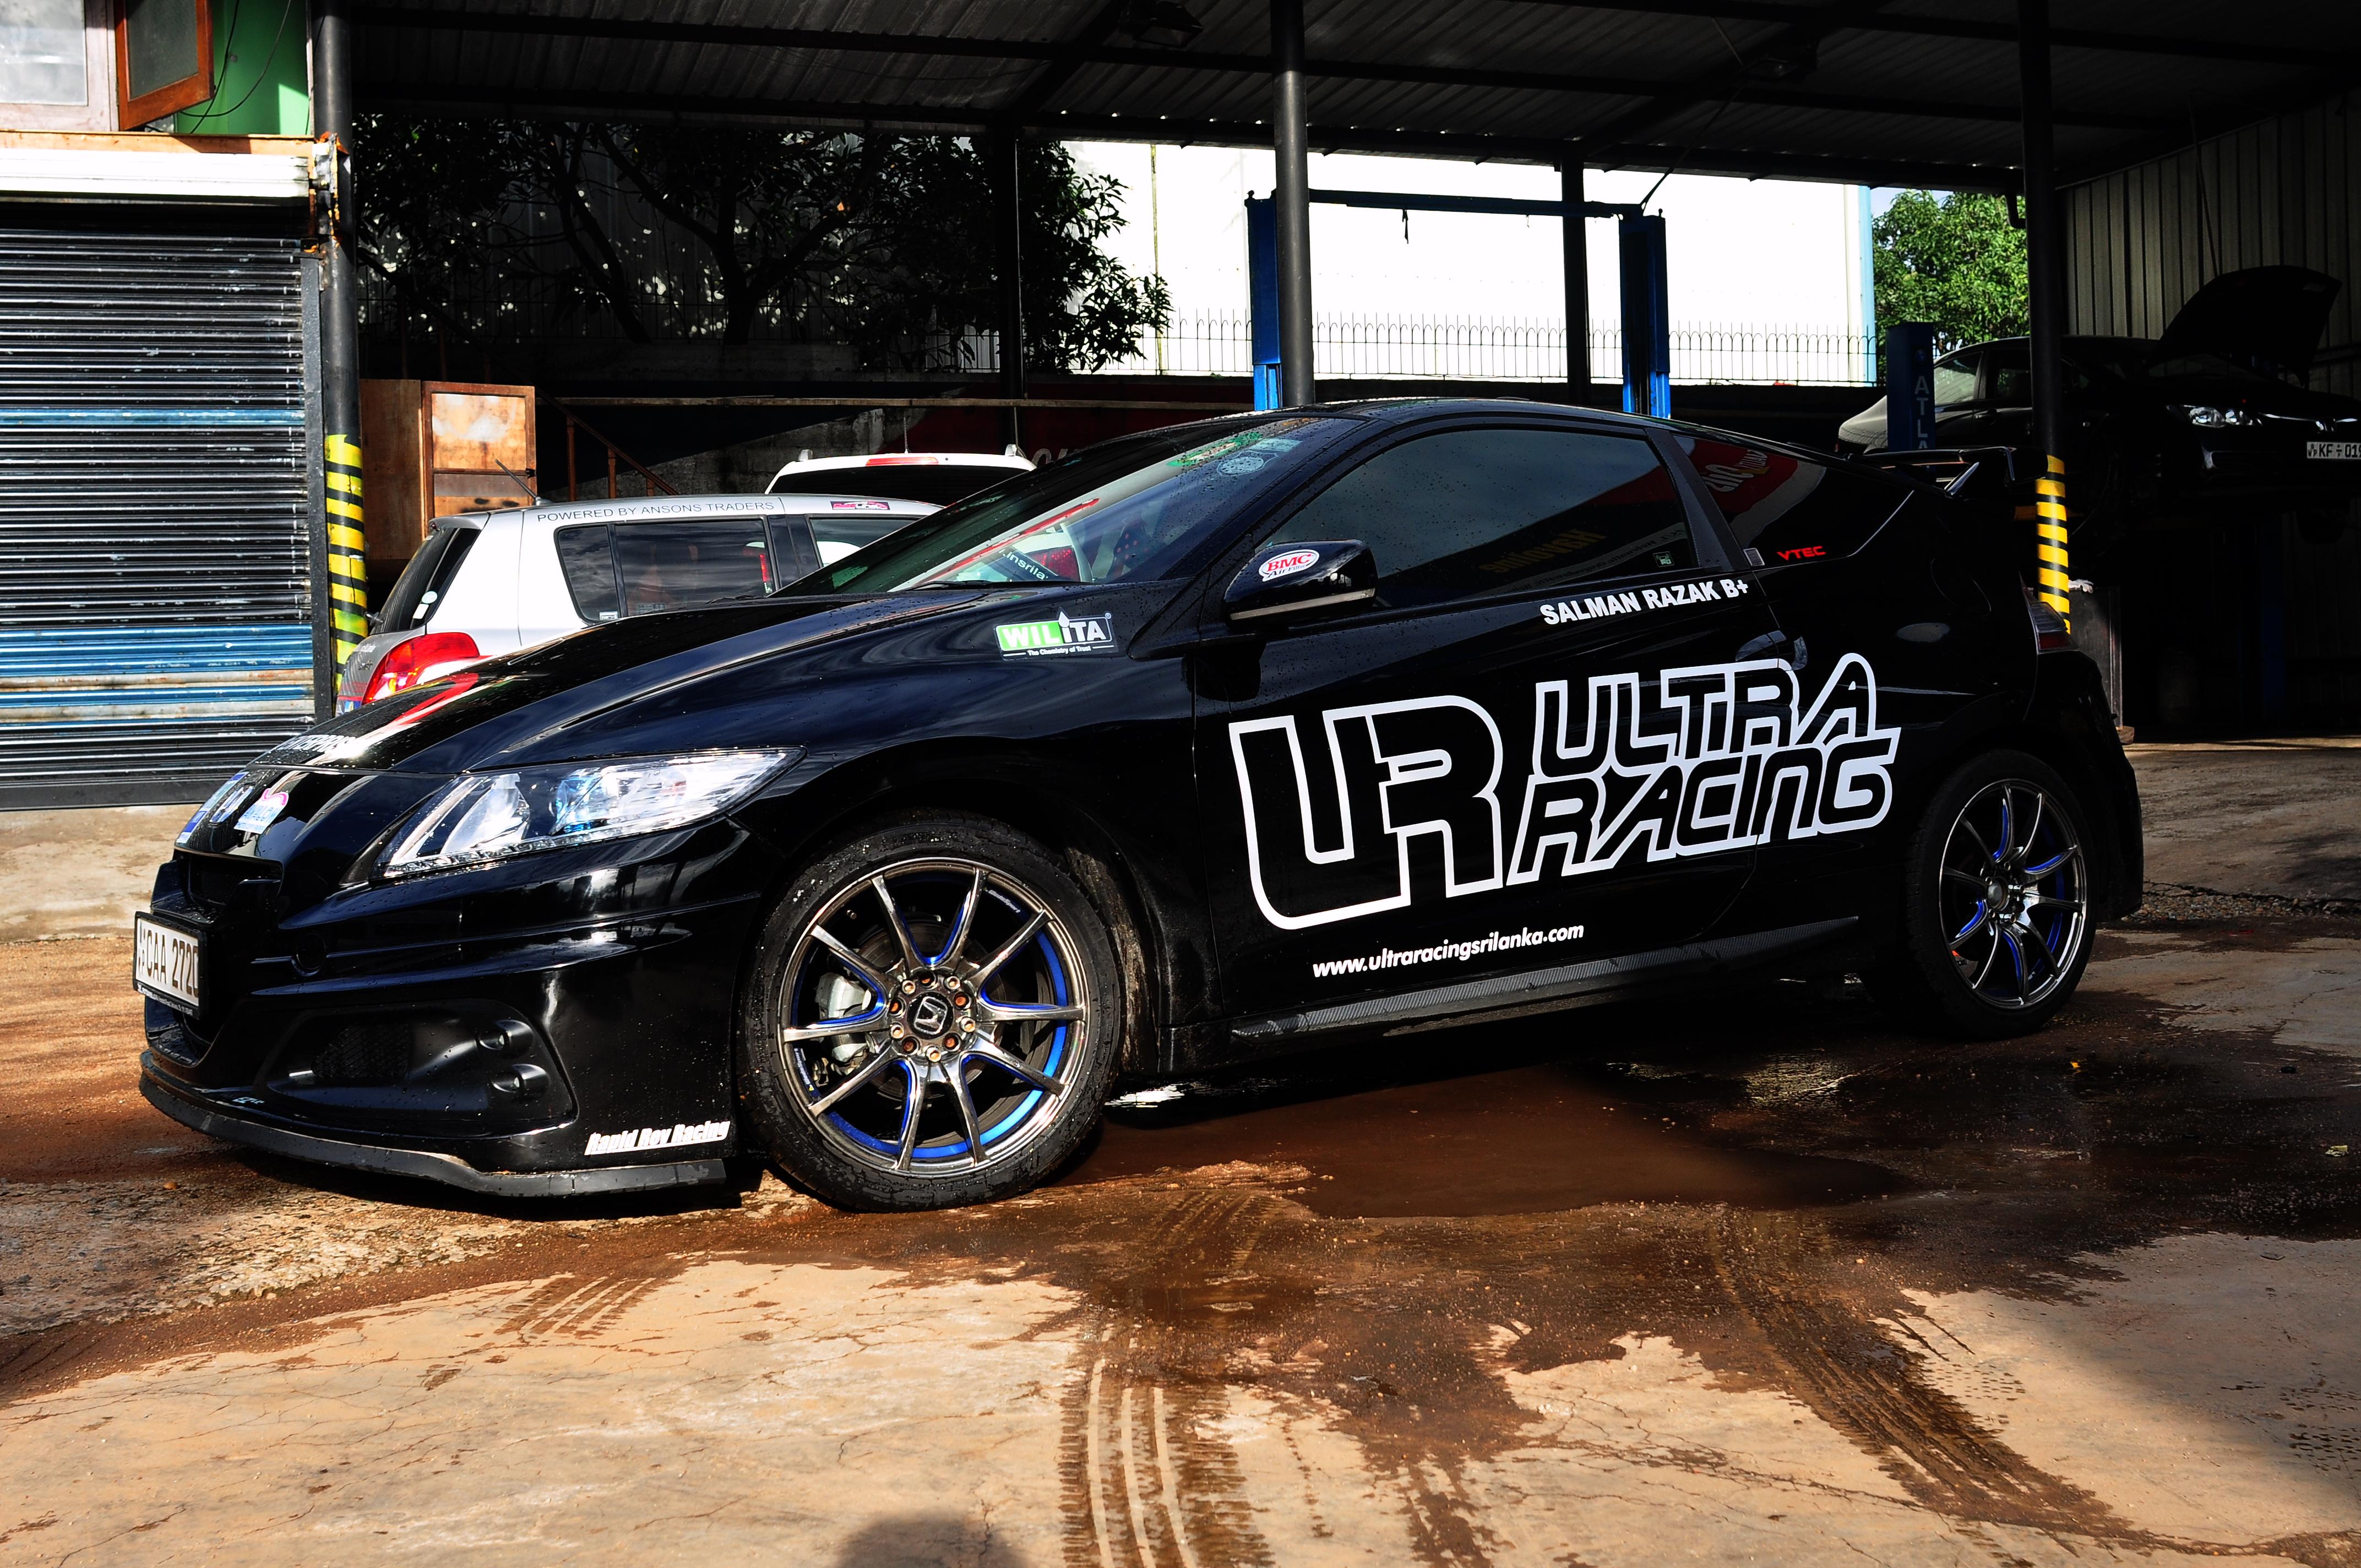 Ultra Racing Sri Lanka / Ansons Traders - Pure Performance